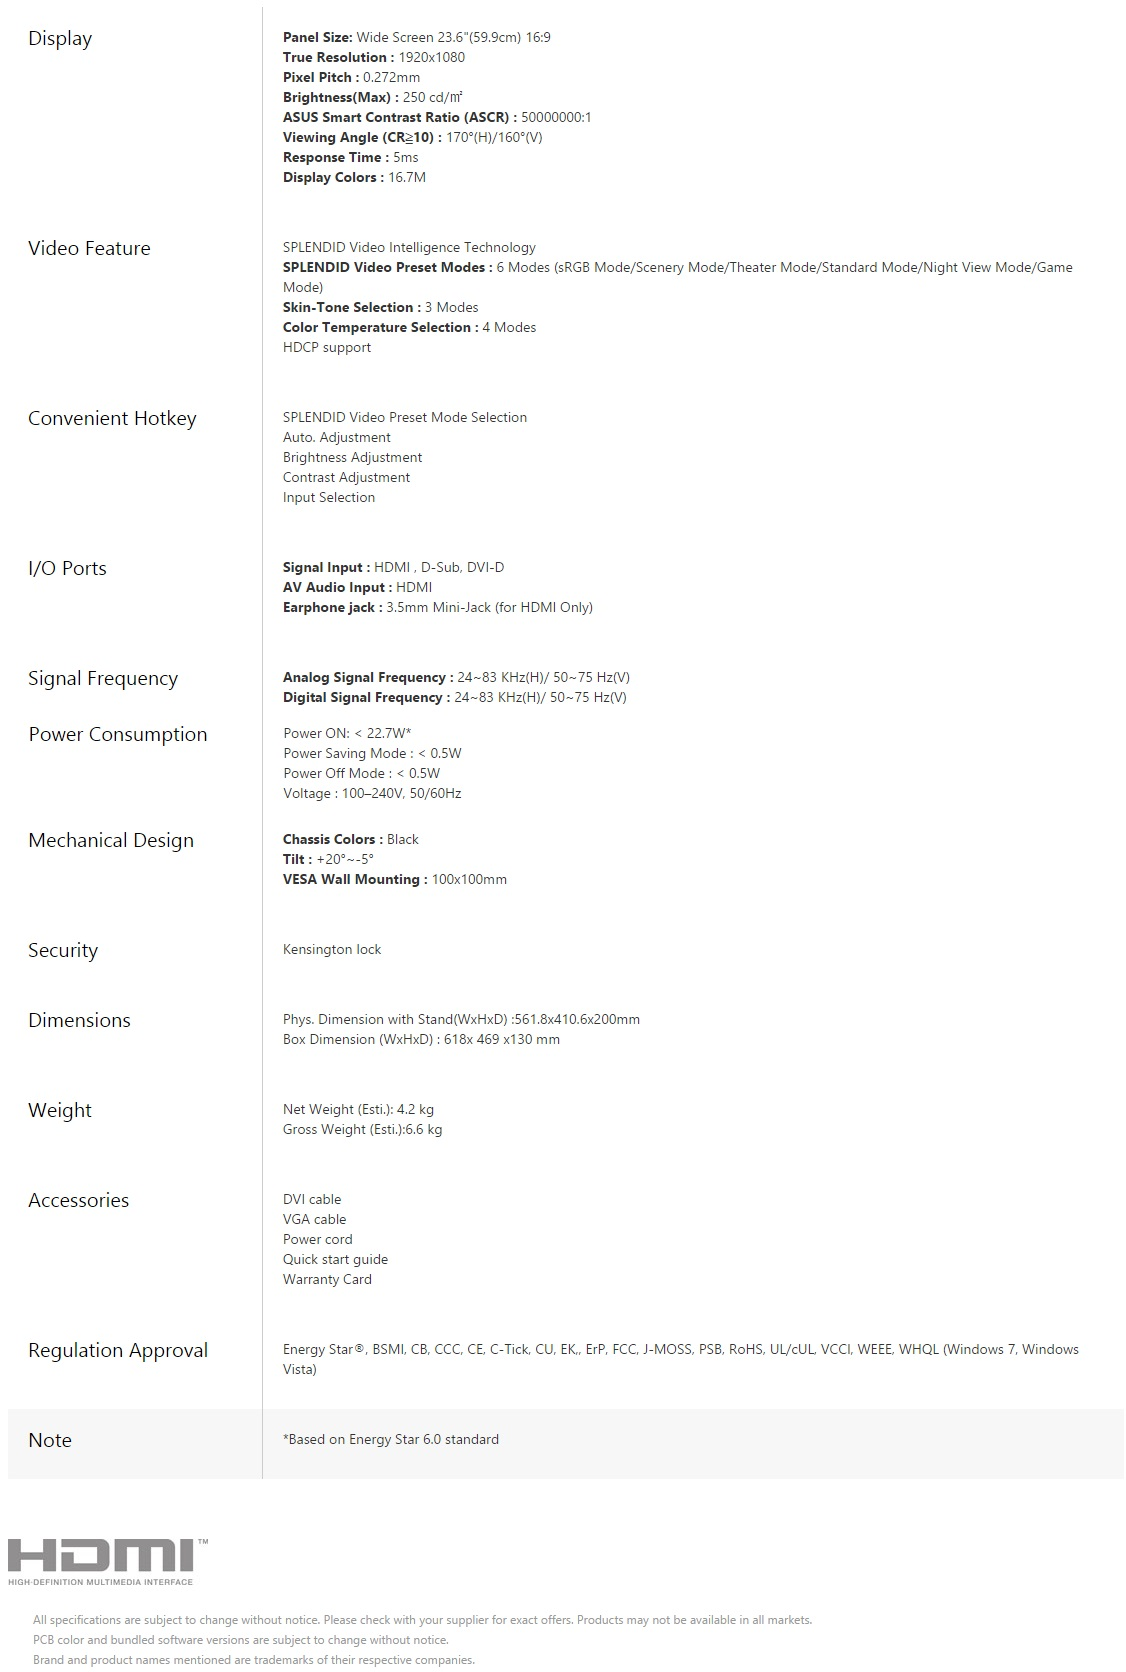 Asus Vs247hv 236 Eyecare Spk Splendid Quickfit Monitor Vp247qg Gaming Full Hd Tn 1ms 75hz Freesync Speaker Manufacturer Specifications